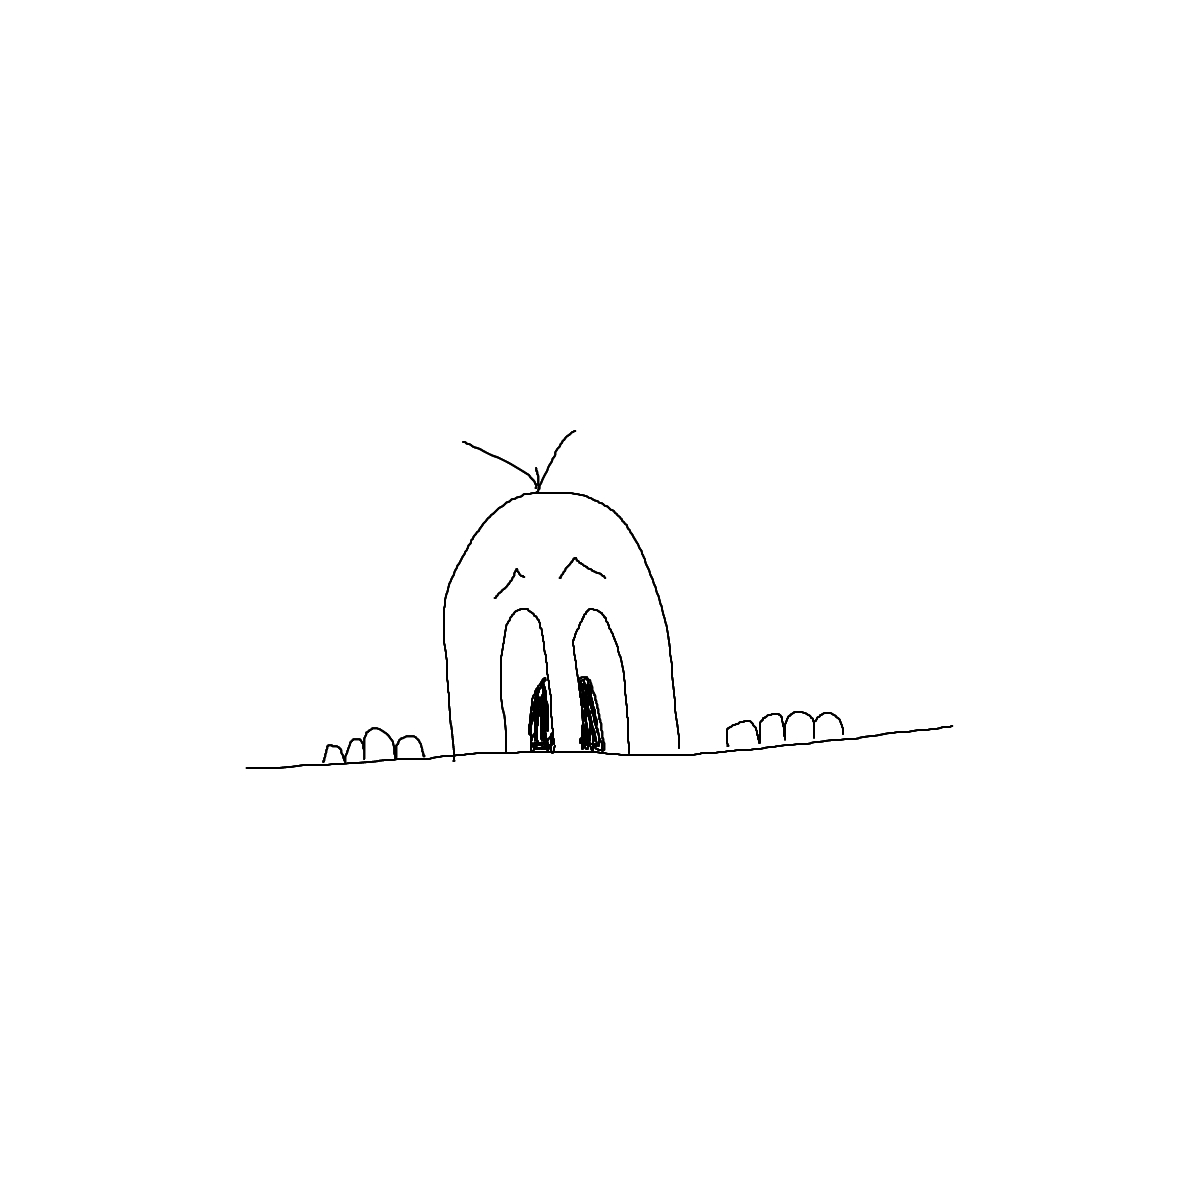 BAAAM drawing#22315 lat:45.9230804443359400lng: 4.8870201110839840